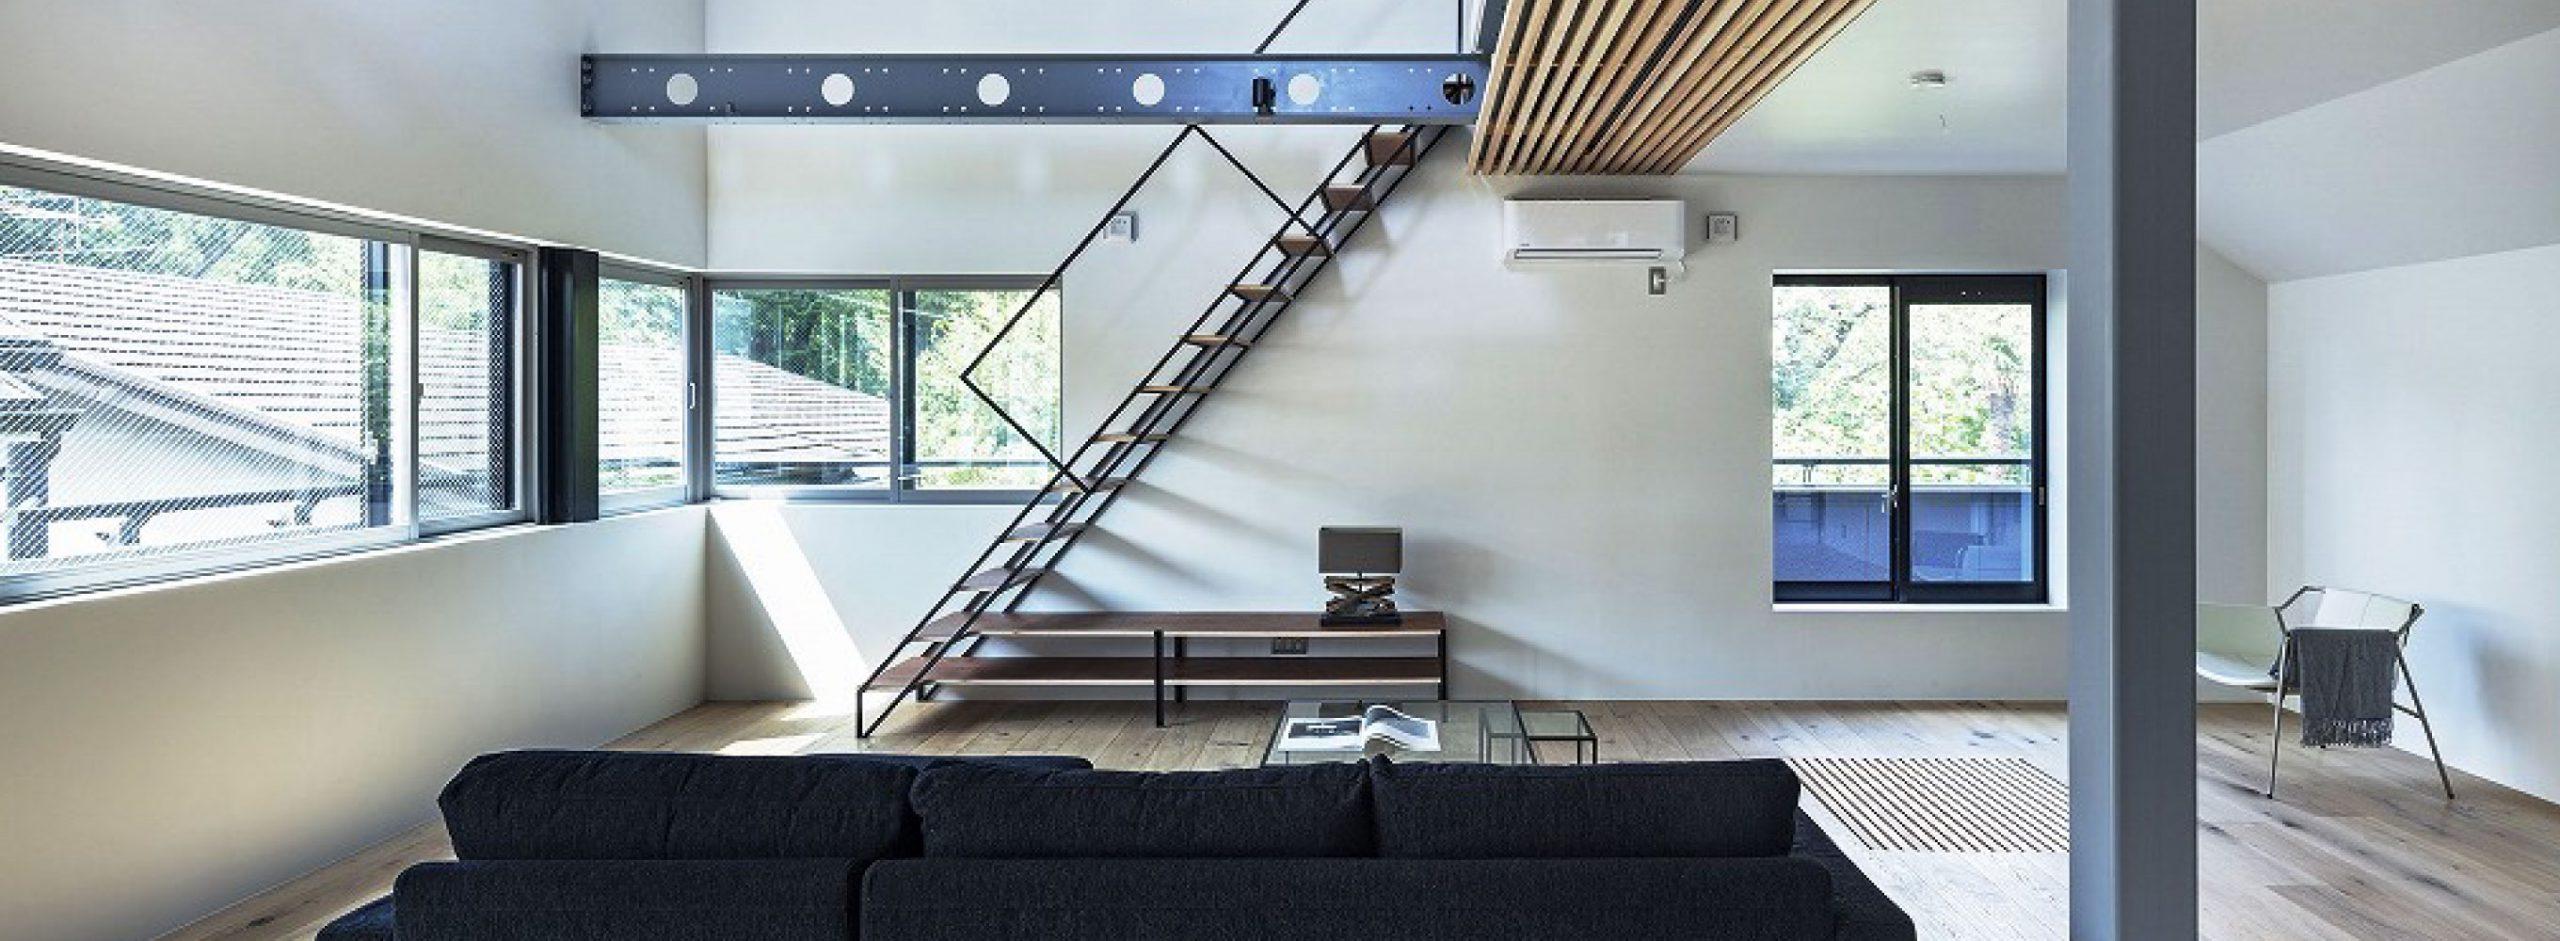 R100 TOKYO番外編 ~ 戸建てで挑戦する「100年先を見据えた価値の創造」